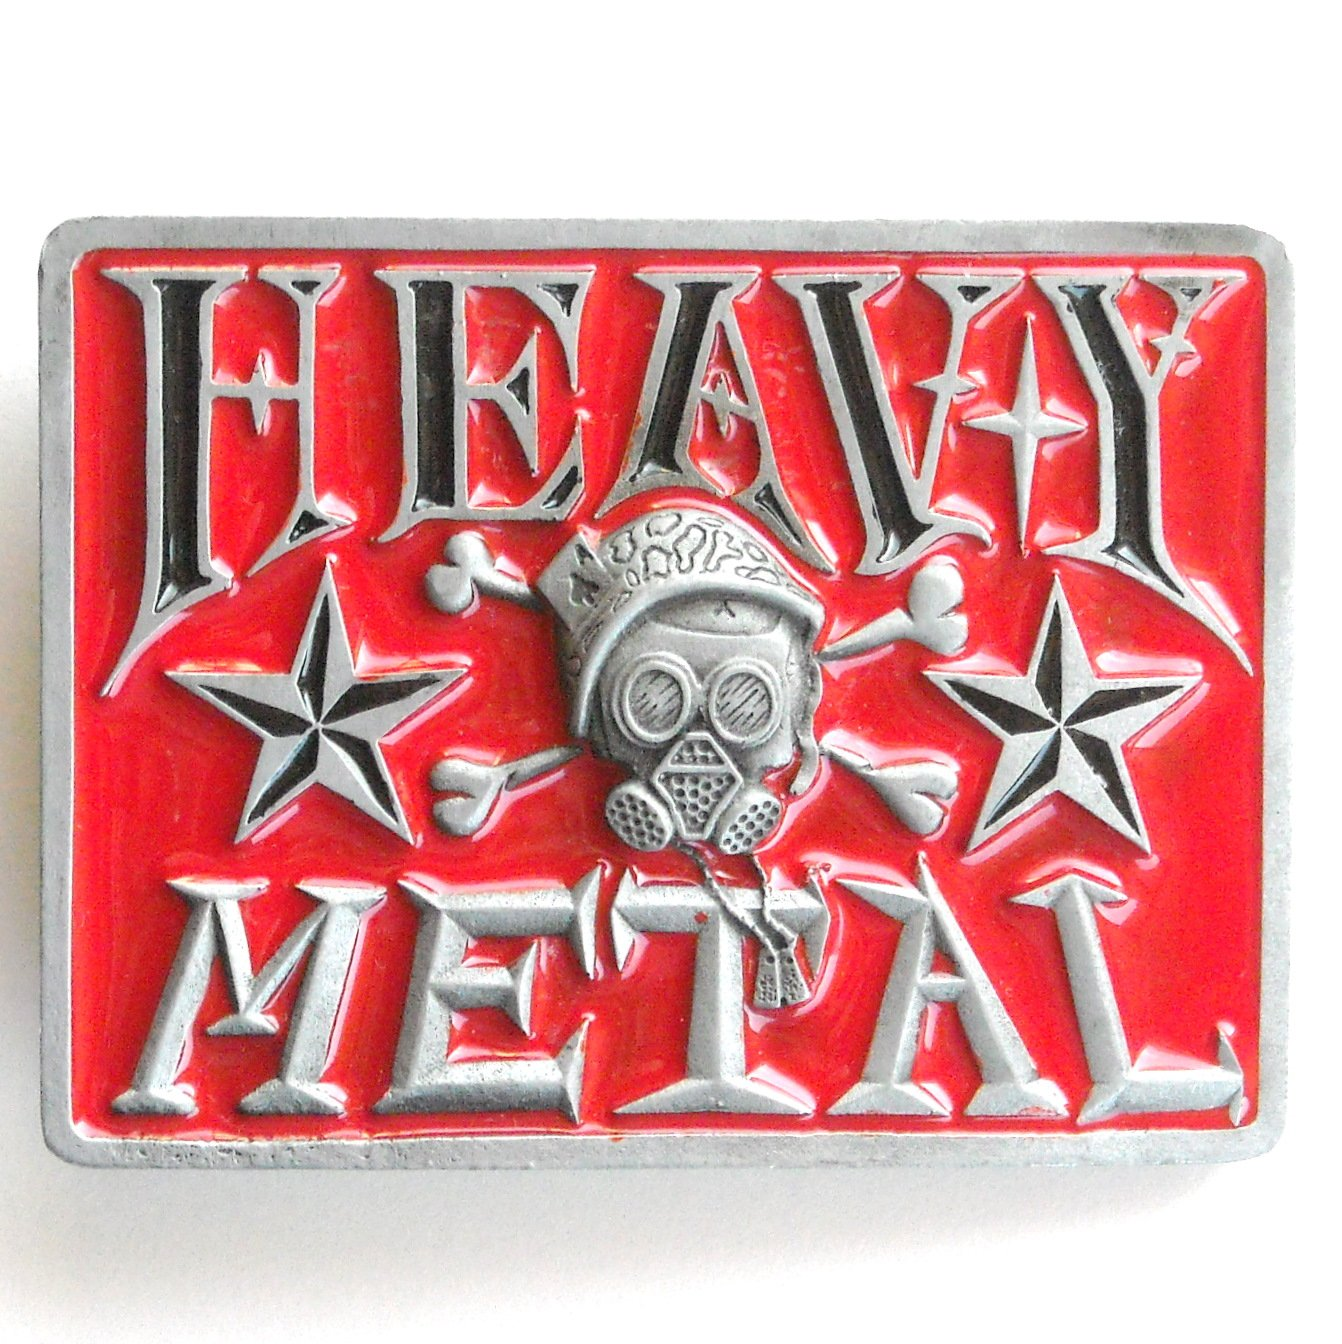 Heavy Metal Red Enamel Rectangle Metal Belt Buckle